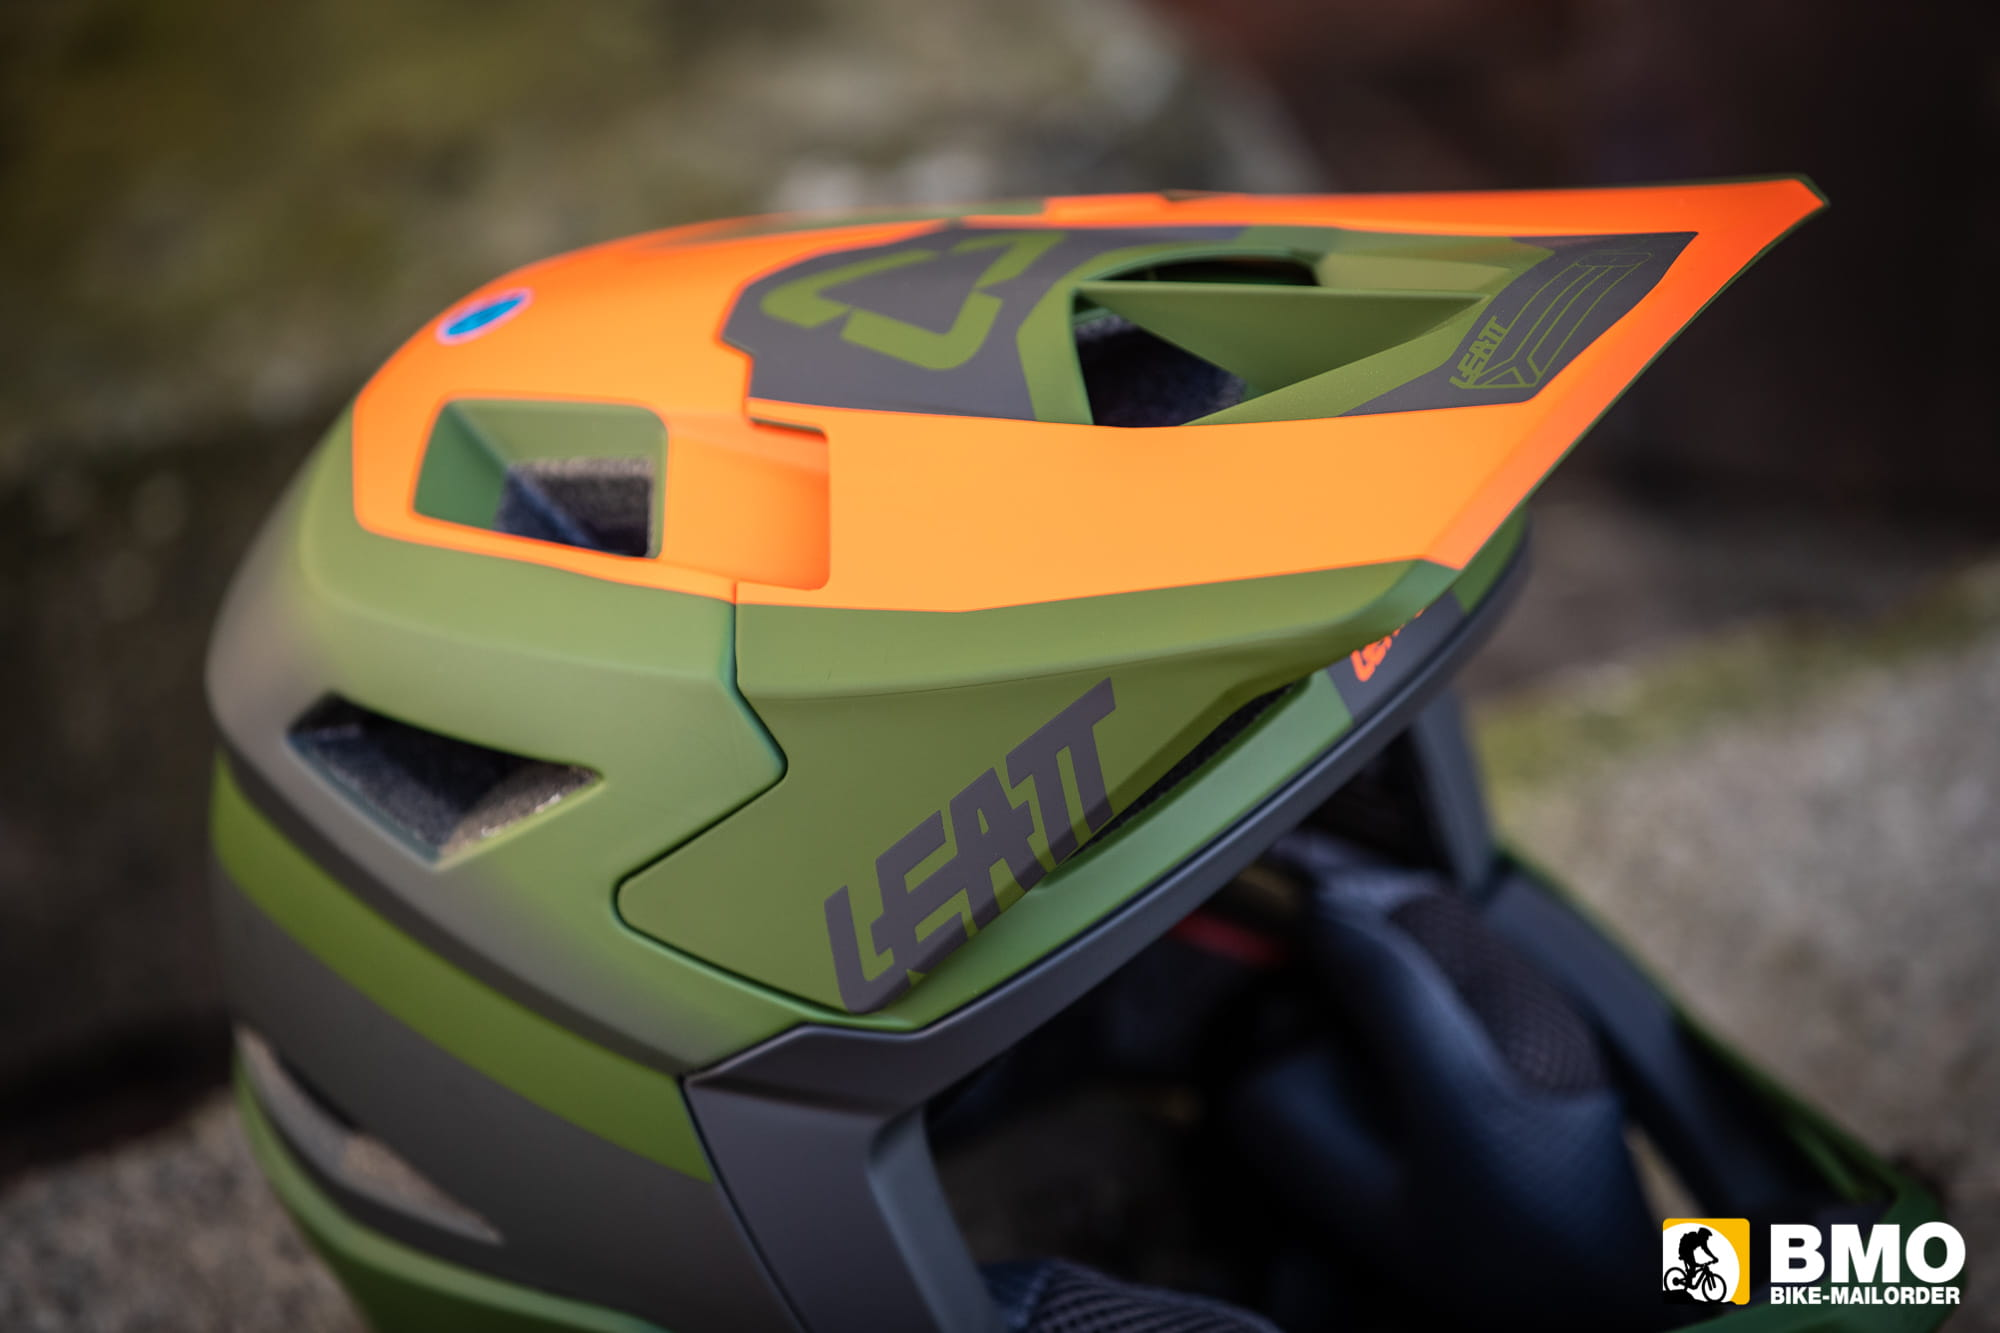 Leatt-DBX-4-0-Super-Ventilated-Fullface-Helm-Bike-Mailorder-6